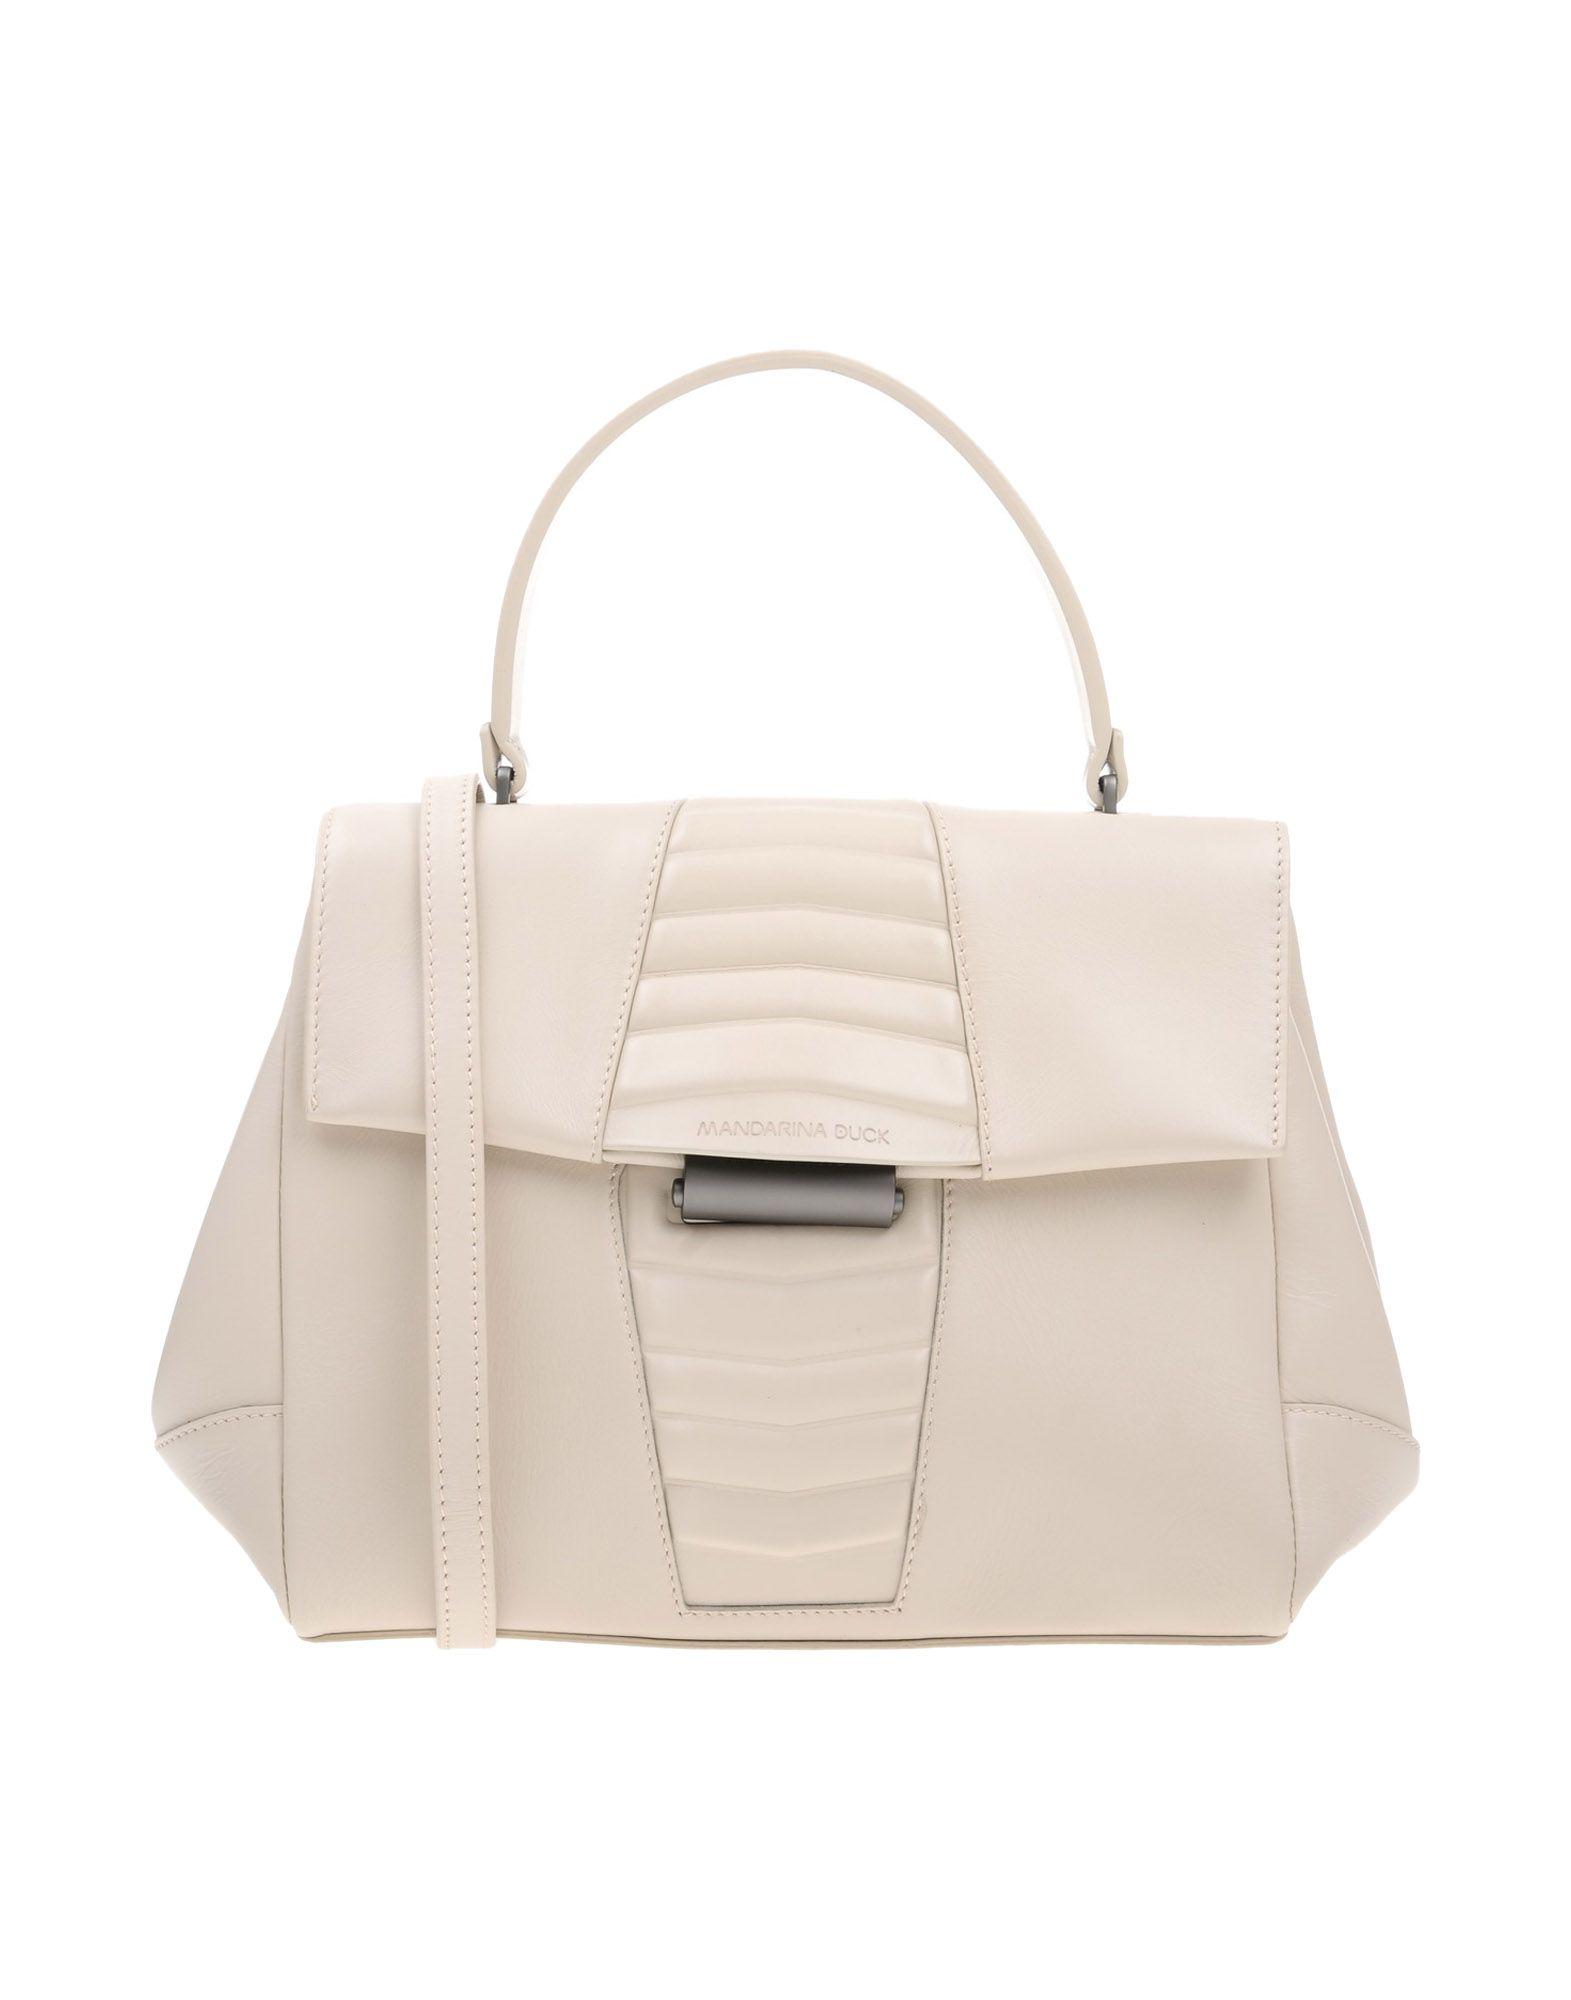 MANDARINA DUCK Handbag in Beige